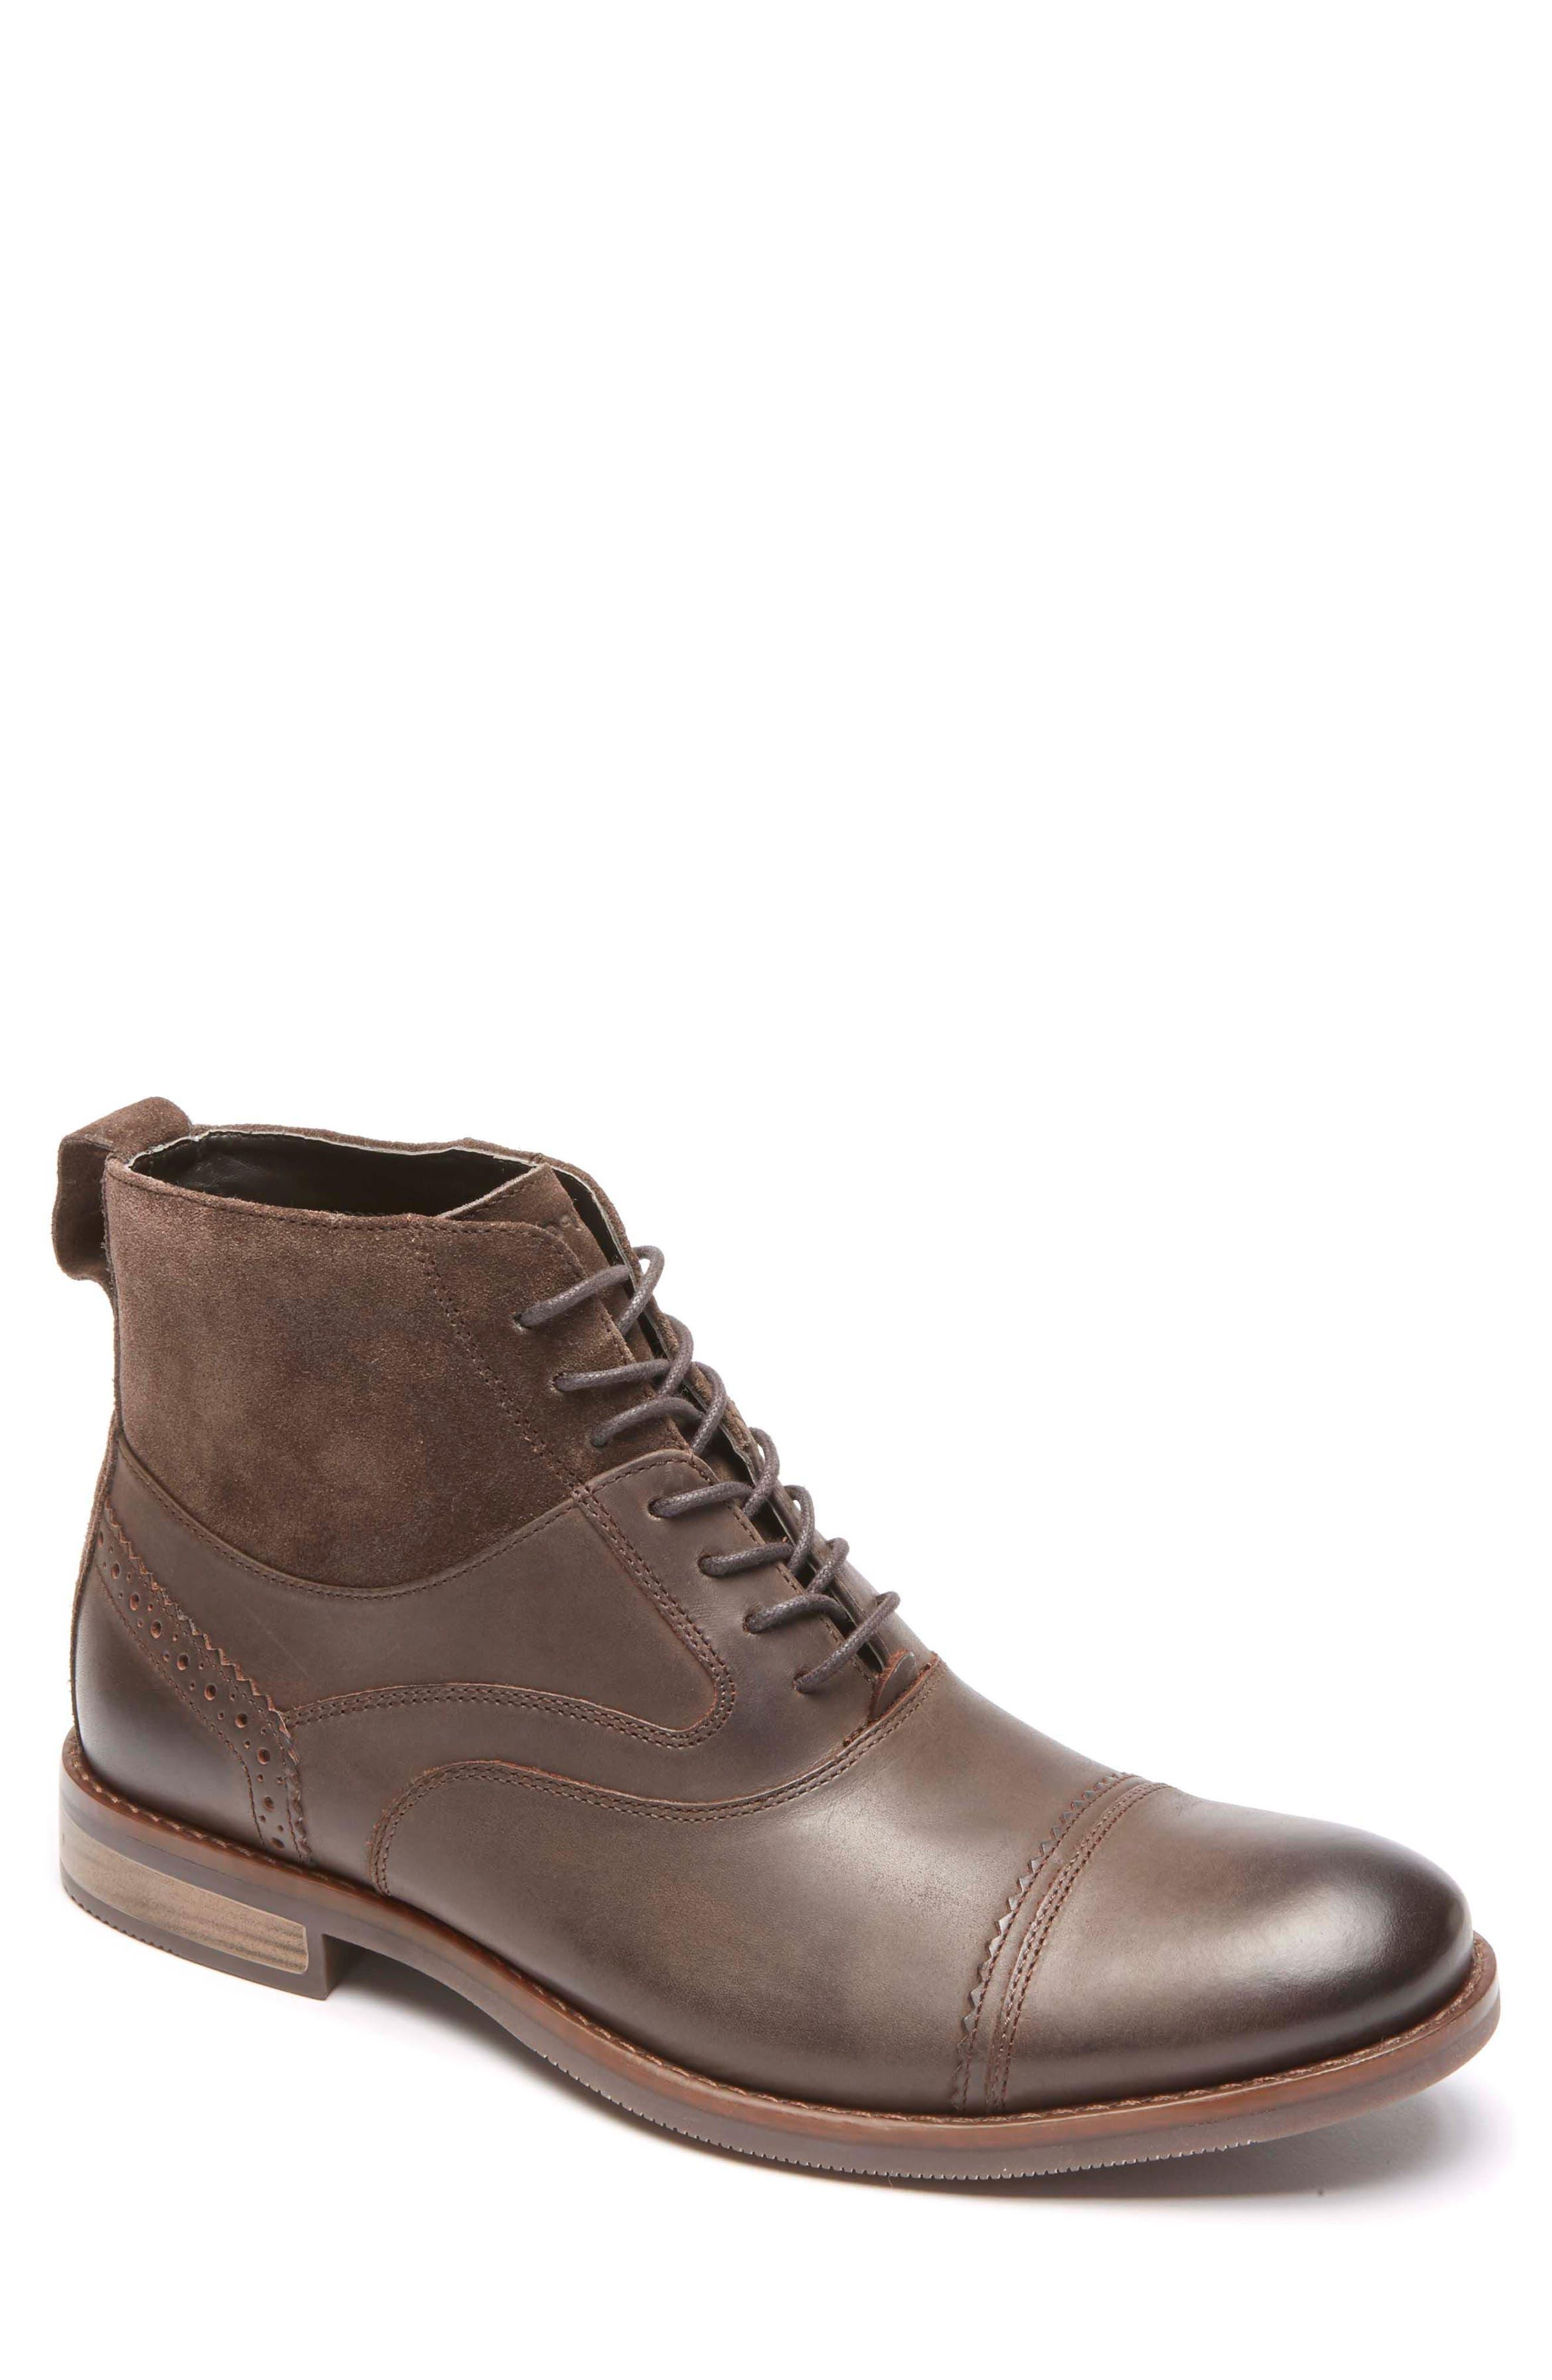 Wynstin Cap Toe Boot,                             Main thumbnail 1, color,                             Dark Chocolate Leather